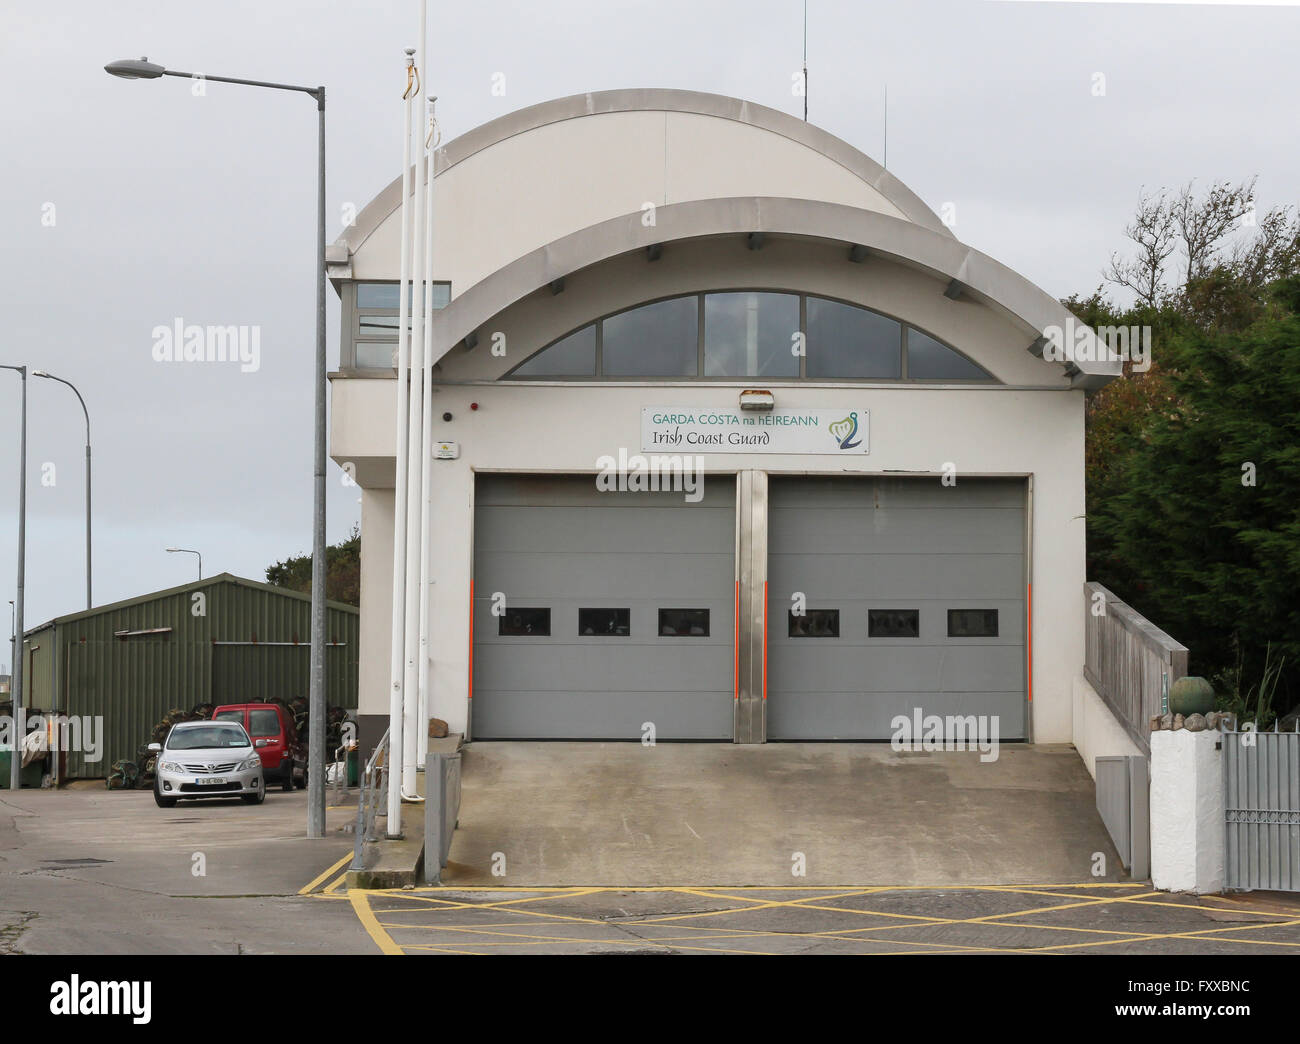 The Irish Coast Guard Station at Bunbeg, Co Donegal. - Stock Image